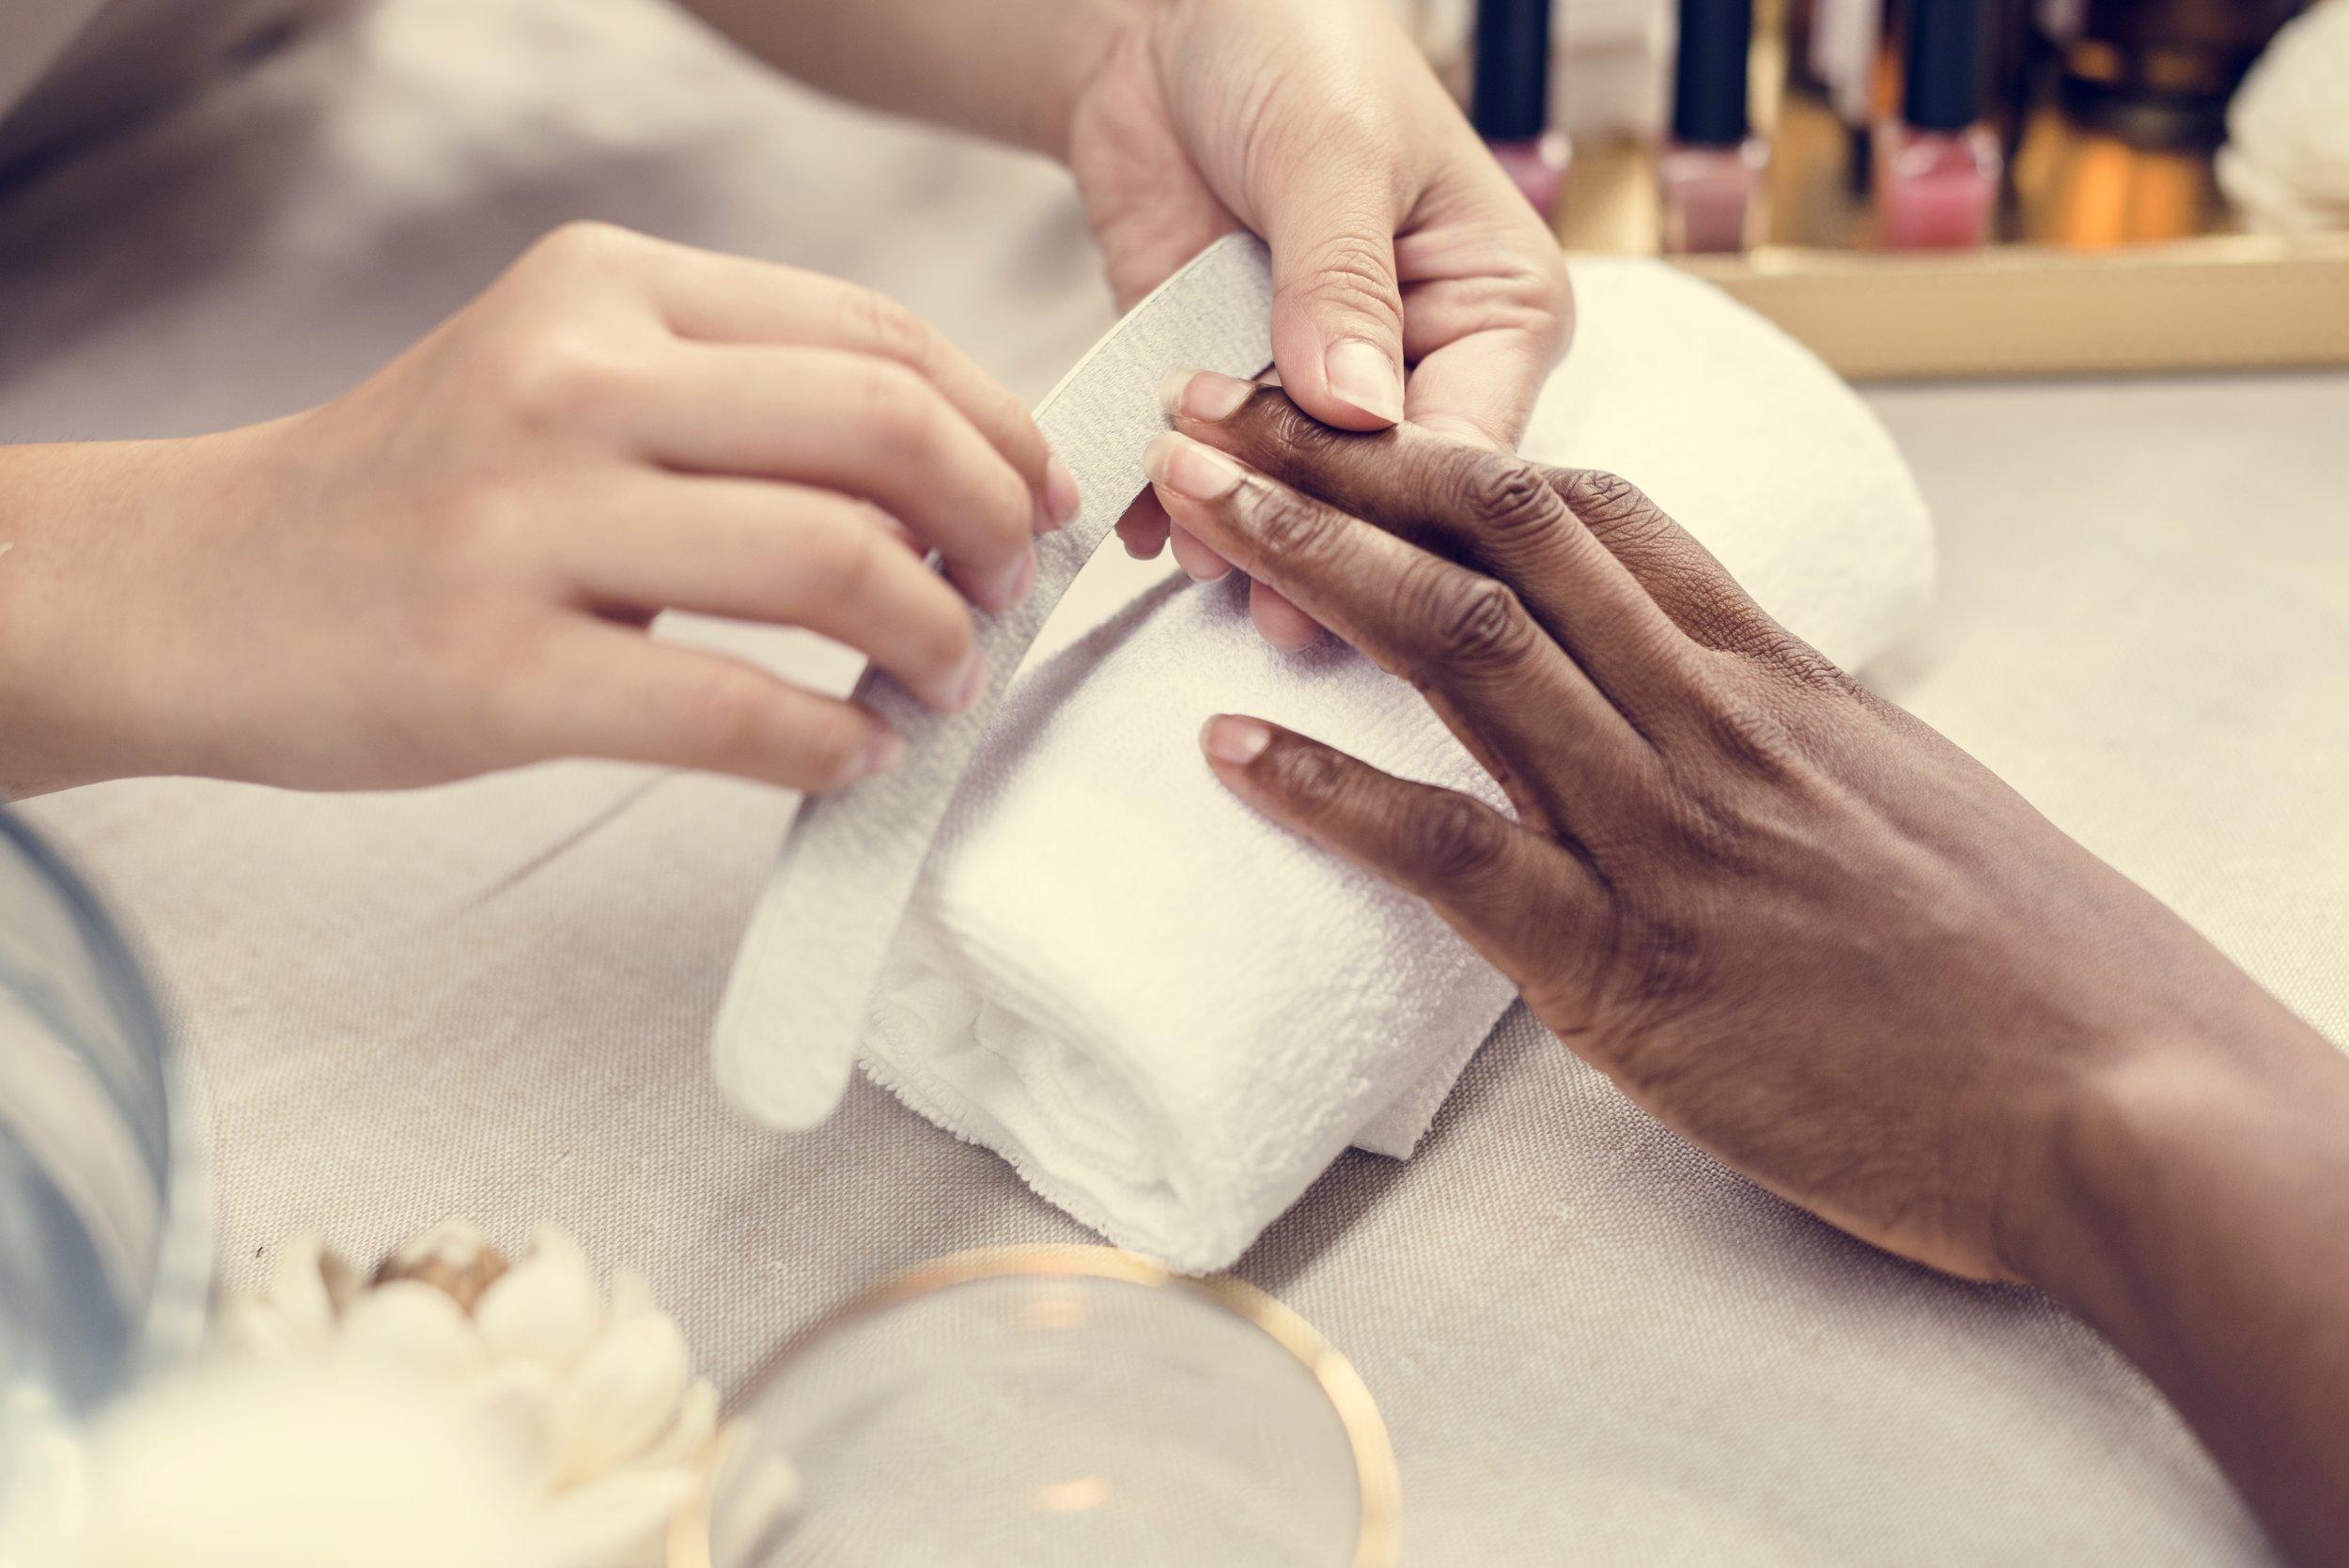 spa-salon-therapy-treatment-PMWXS5V.jpg